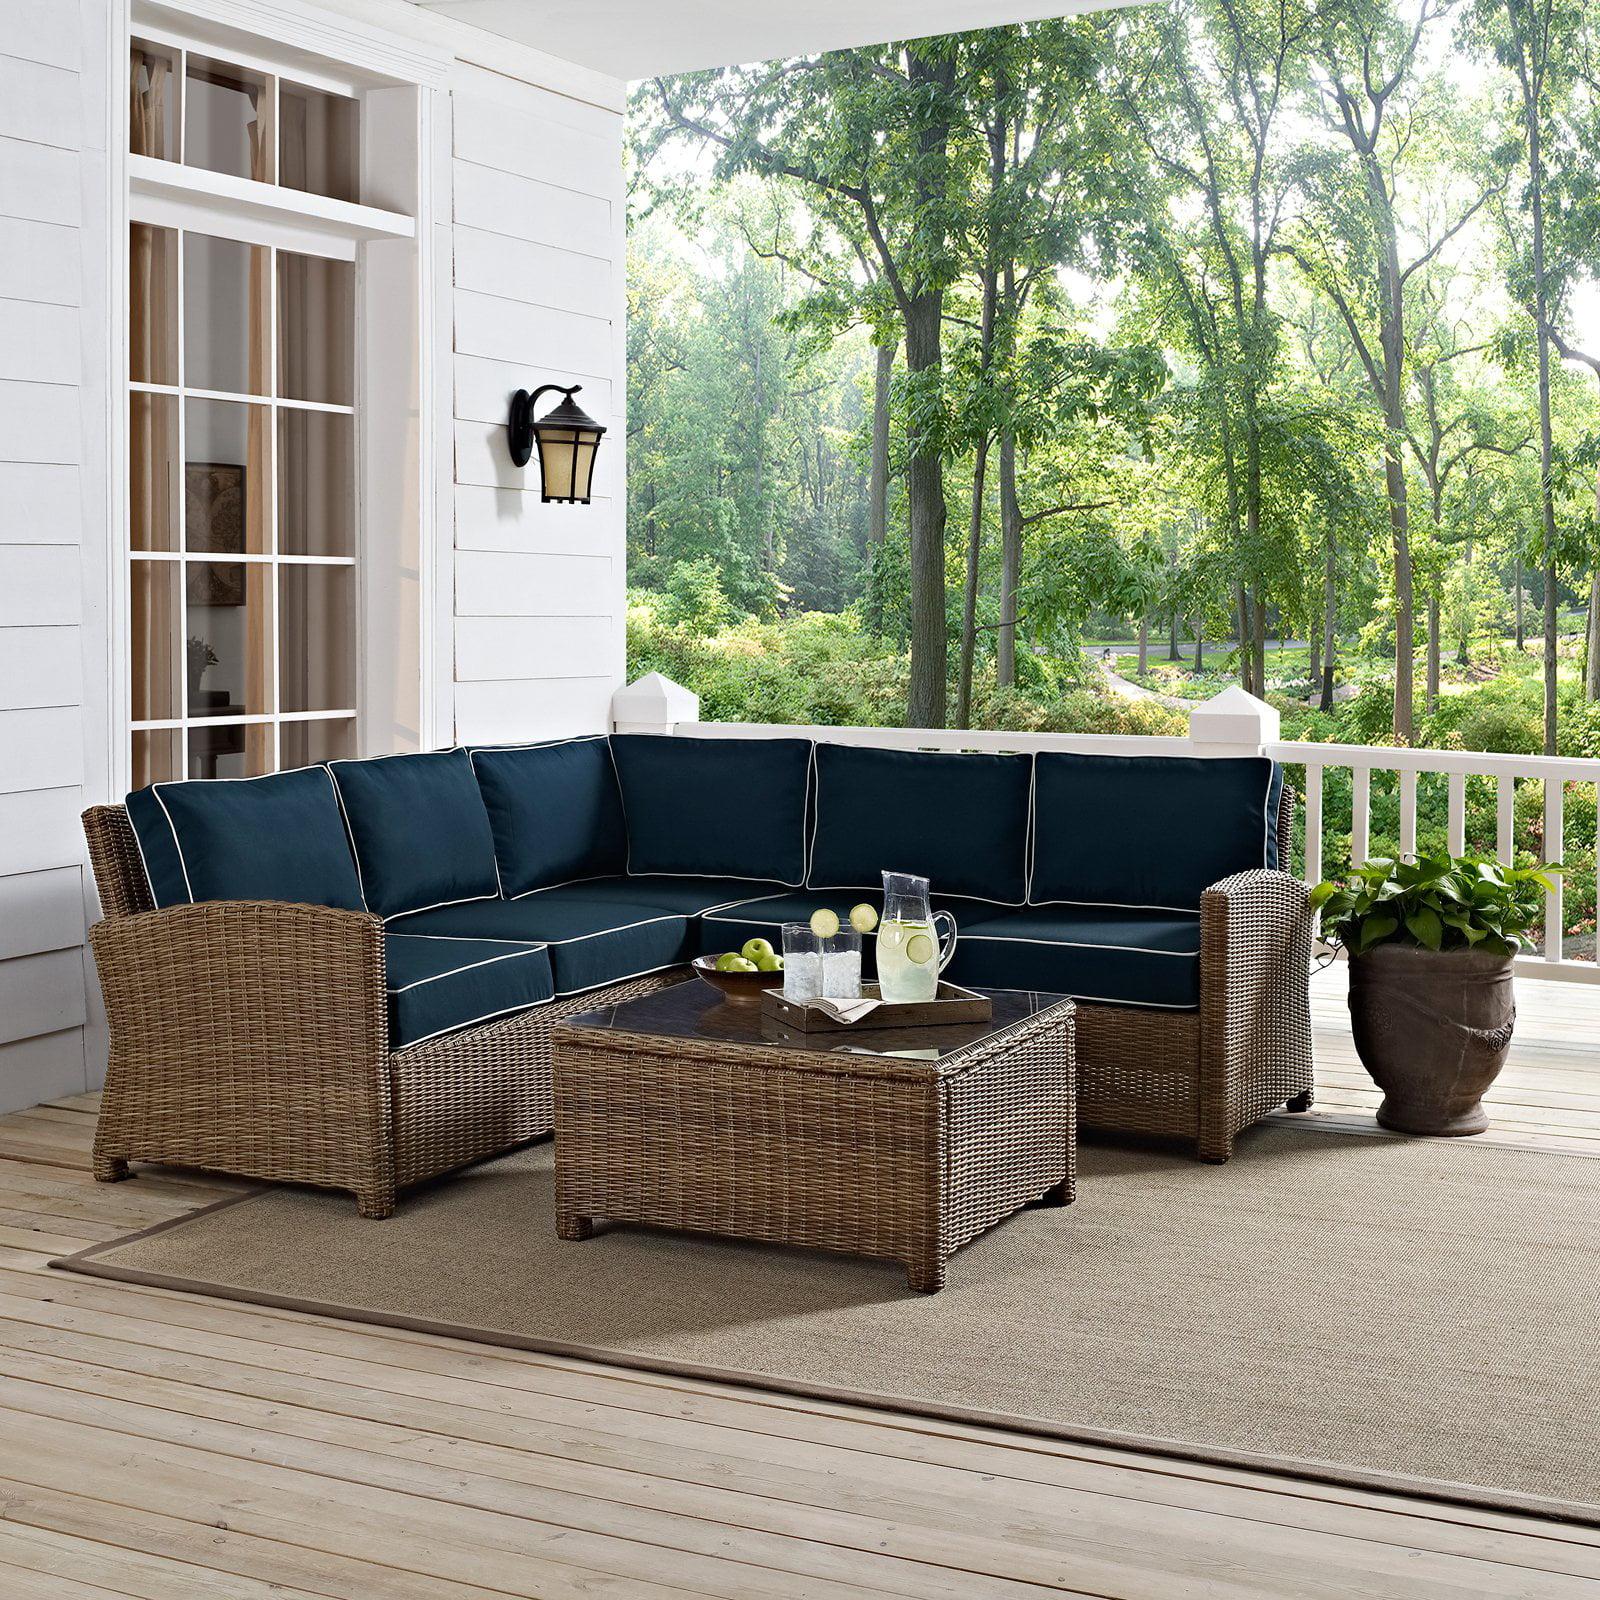 Crosley Furniture Bradenton 4 Piece Outdoor Wicker Seating Set